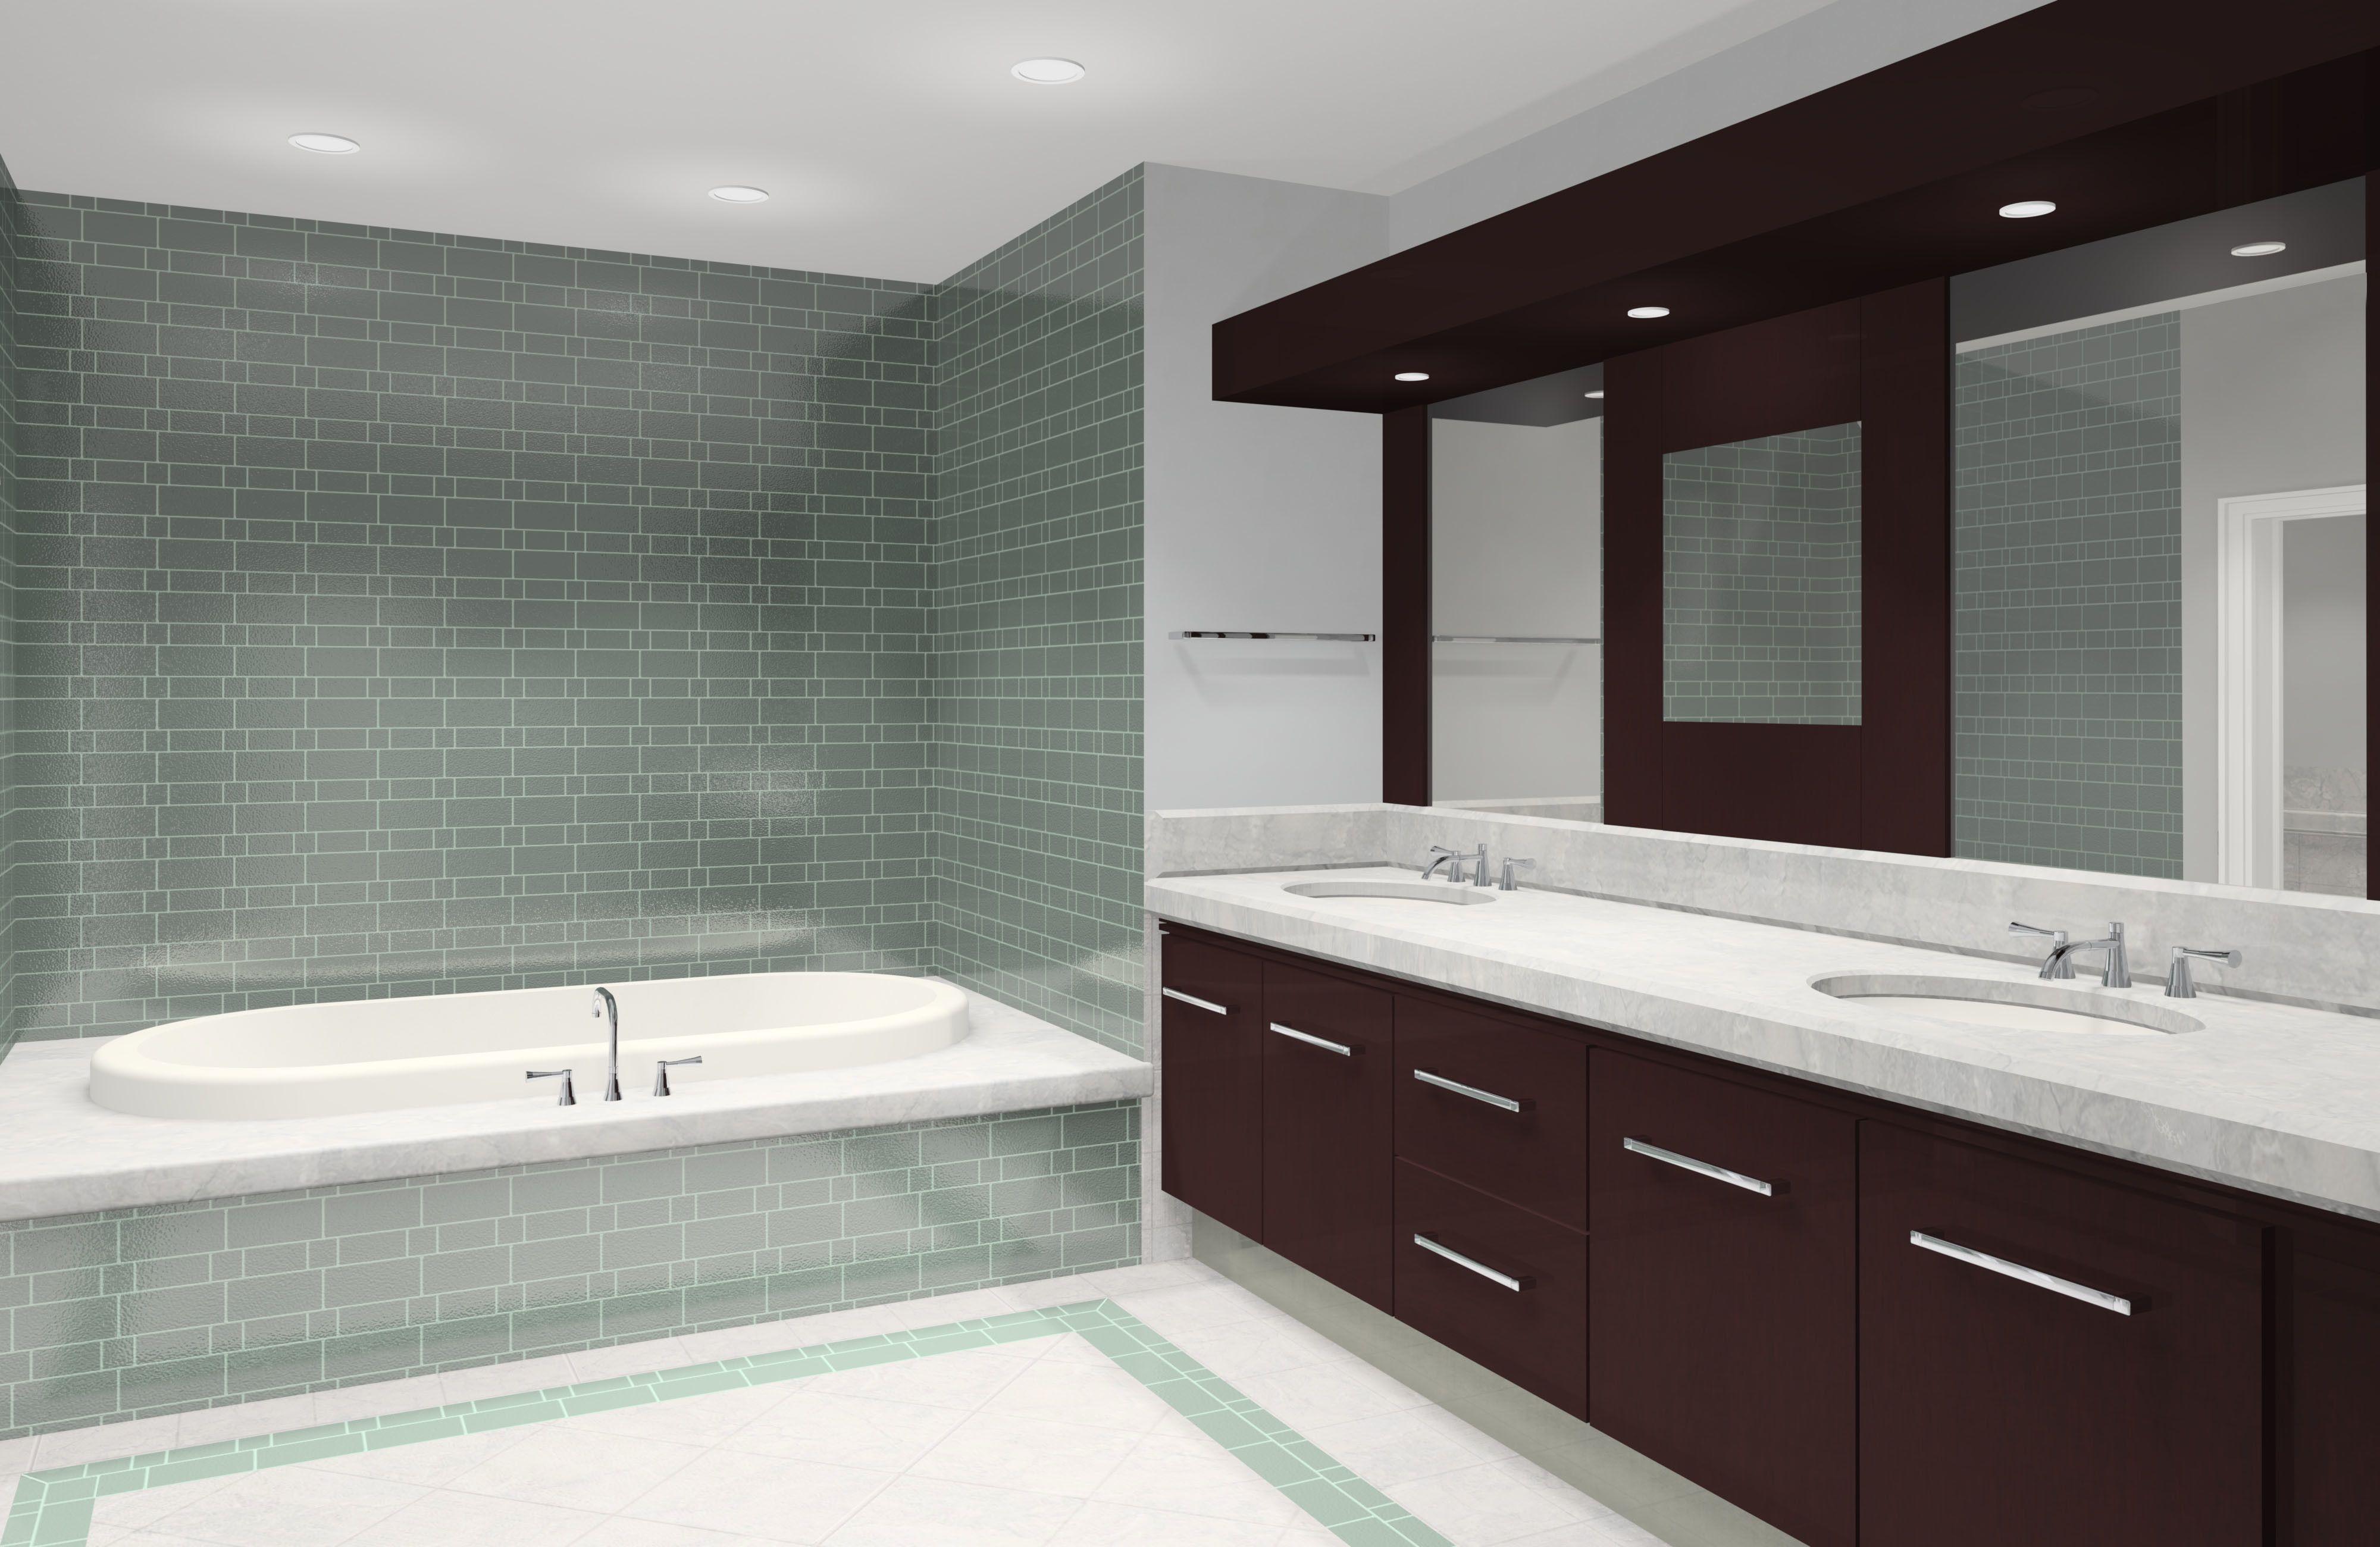 10 Best images about Bathroom on Pinterest   Wet room bathroom  Double vanity and Shower set. 10 Best images about Bathroom on Pinterest   Wet room bathroom